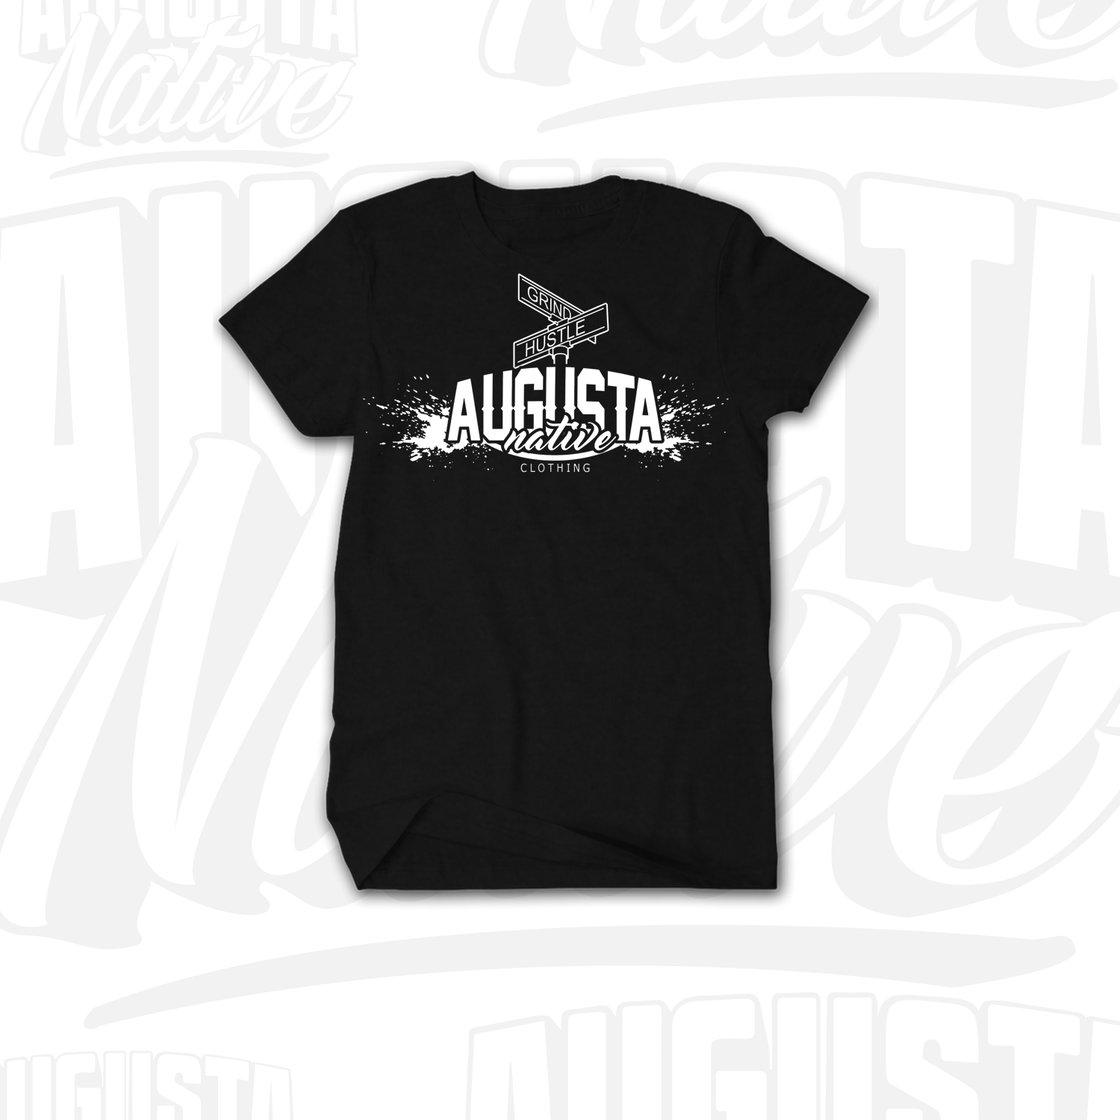 Image of Augusta Native Grind/Hustle - Black/White